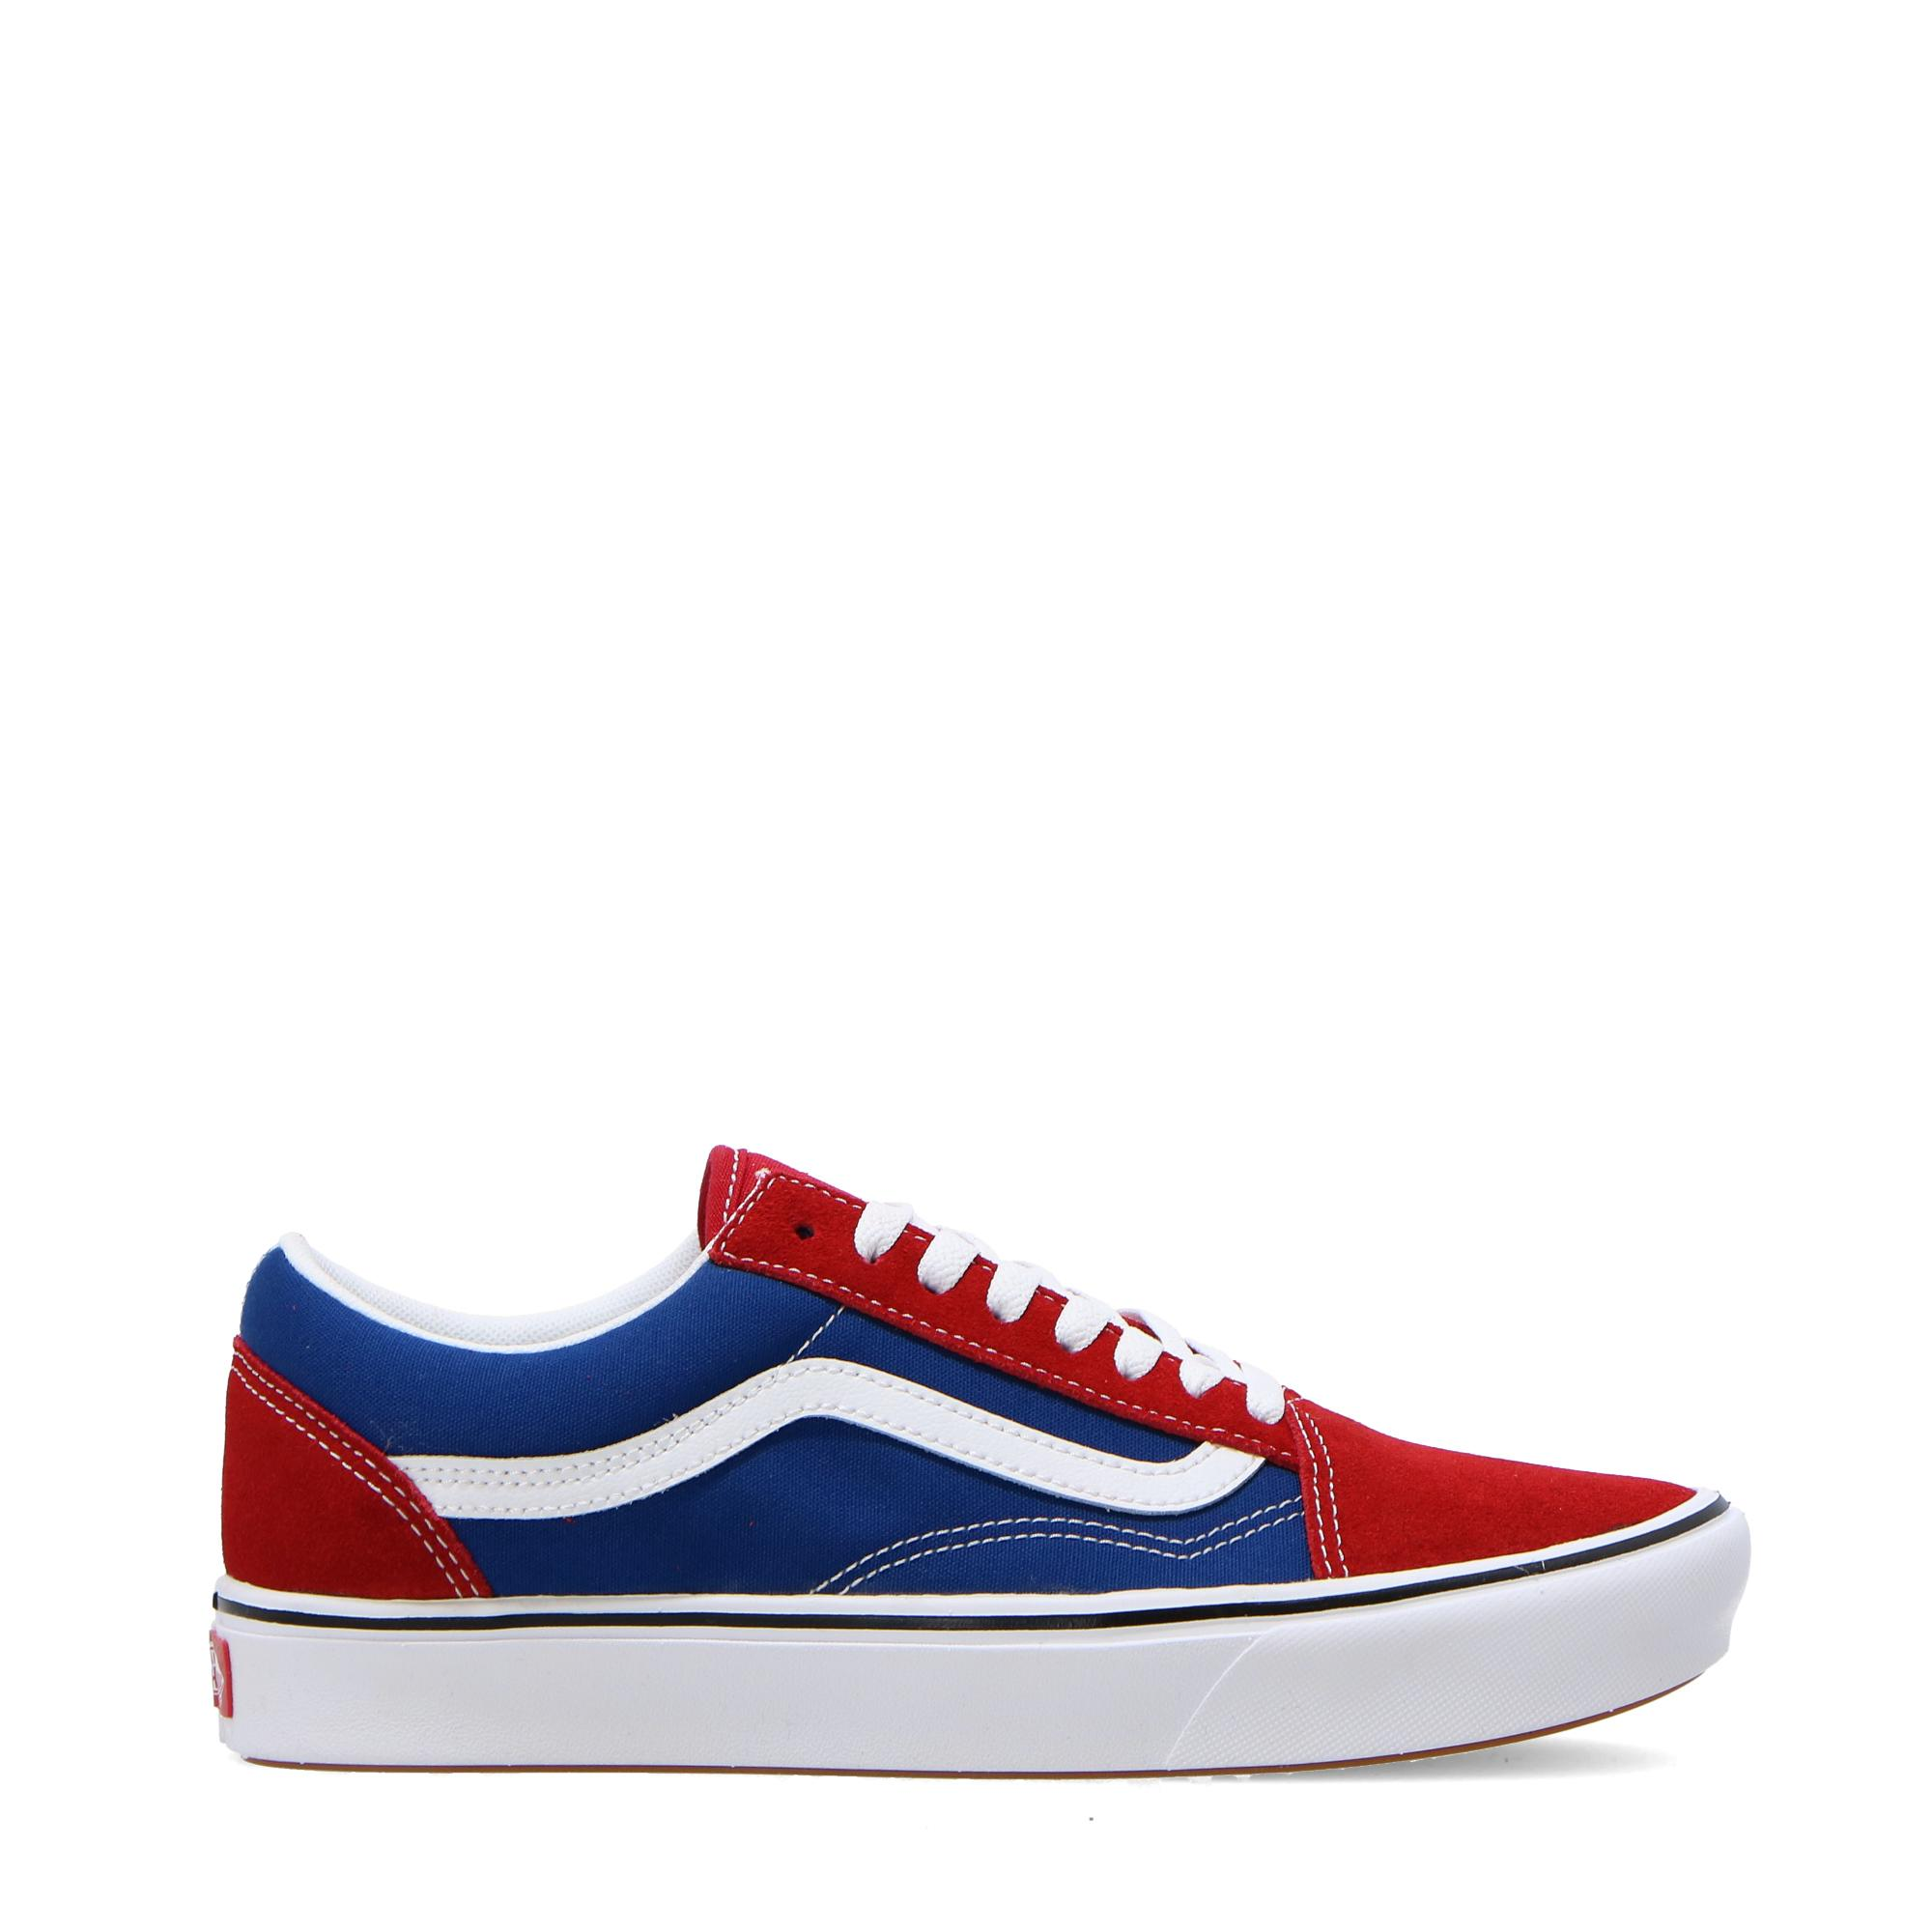 Vans Old Skool ComfyCush Red Chili & Blue Skate Shoes | Zumiez